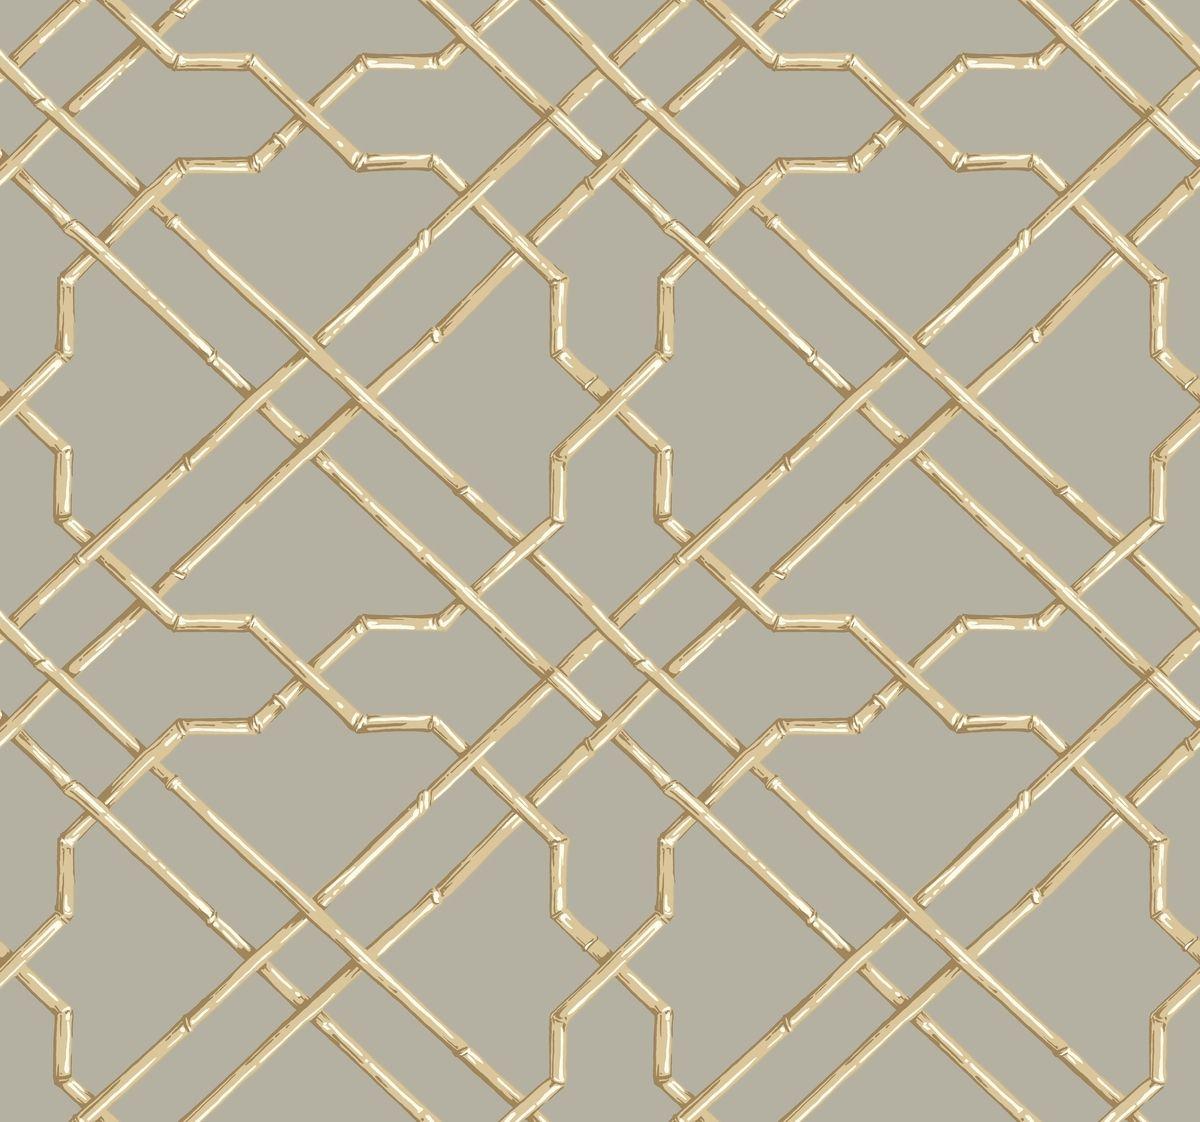 York At7076 Tropics Bamboo Trellis Wallpaper Grey Beige